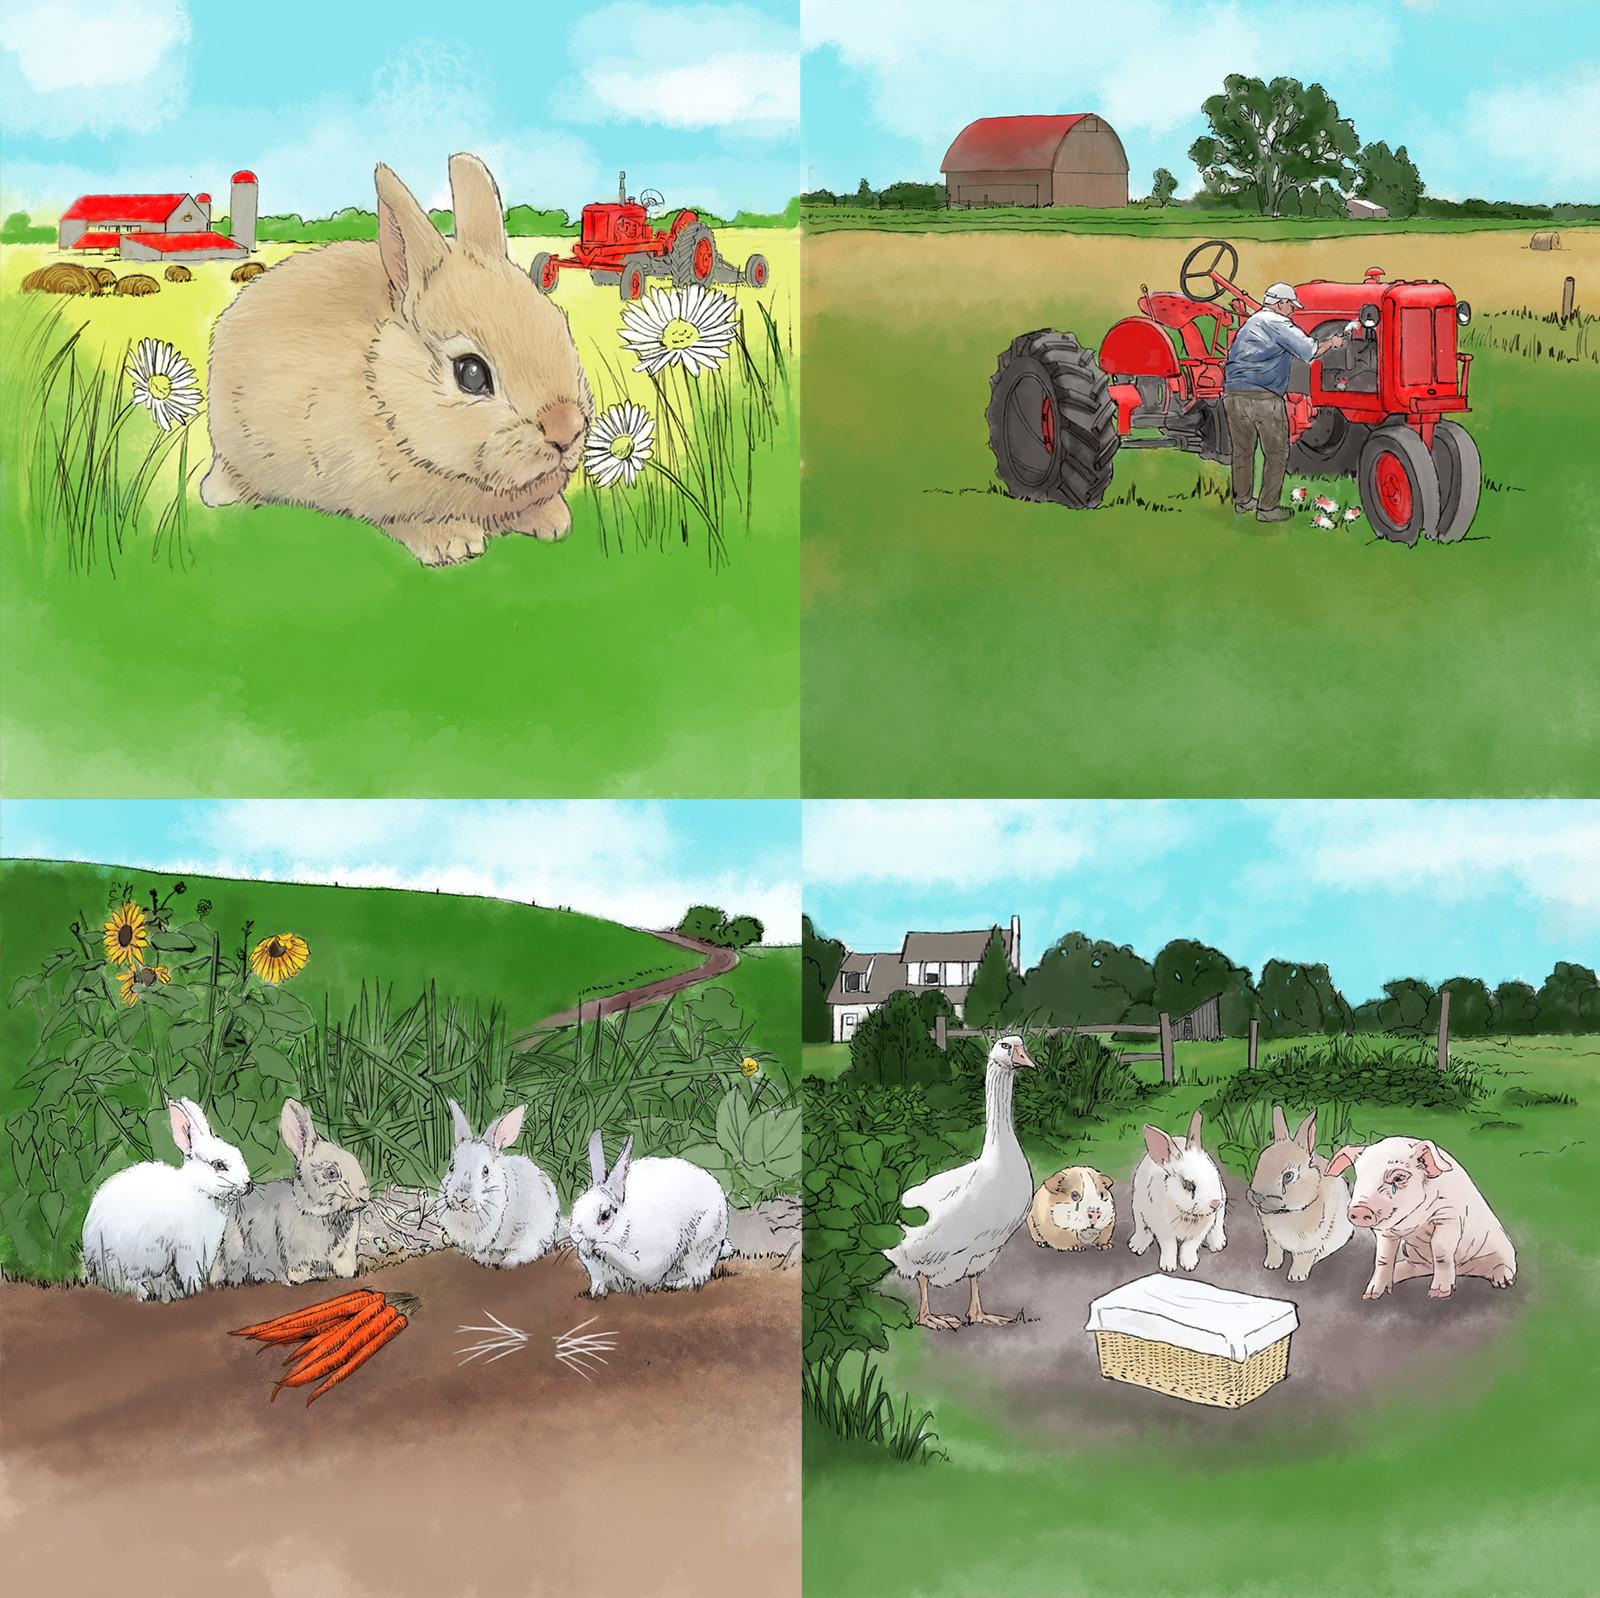 Prop story book about a bunny named Bun Bun that meets a tragic ending. ABC's 'Man Up' Episode 109 Art Director : Lorin Flemming